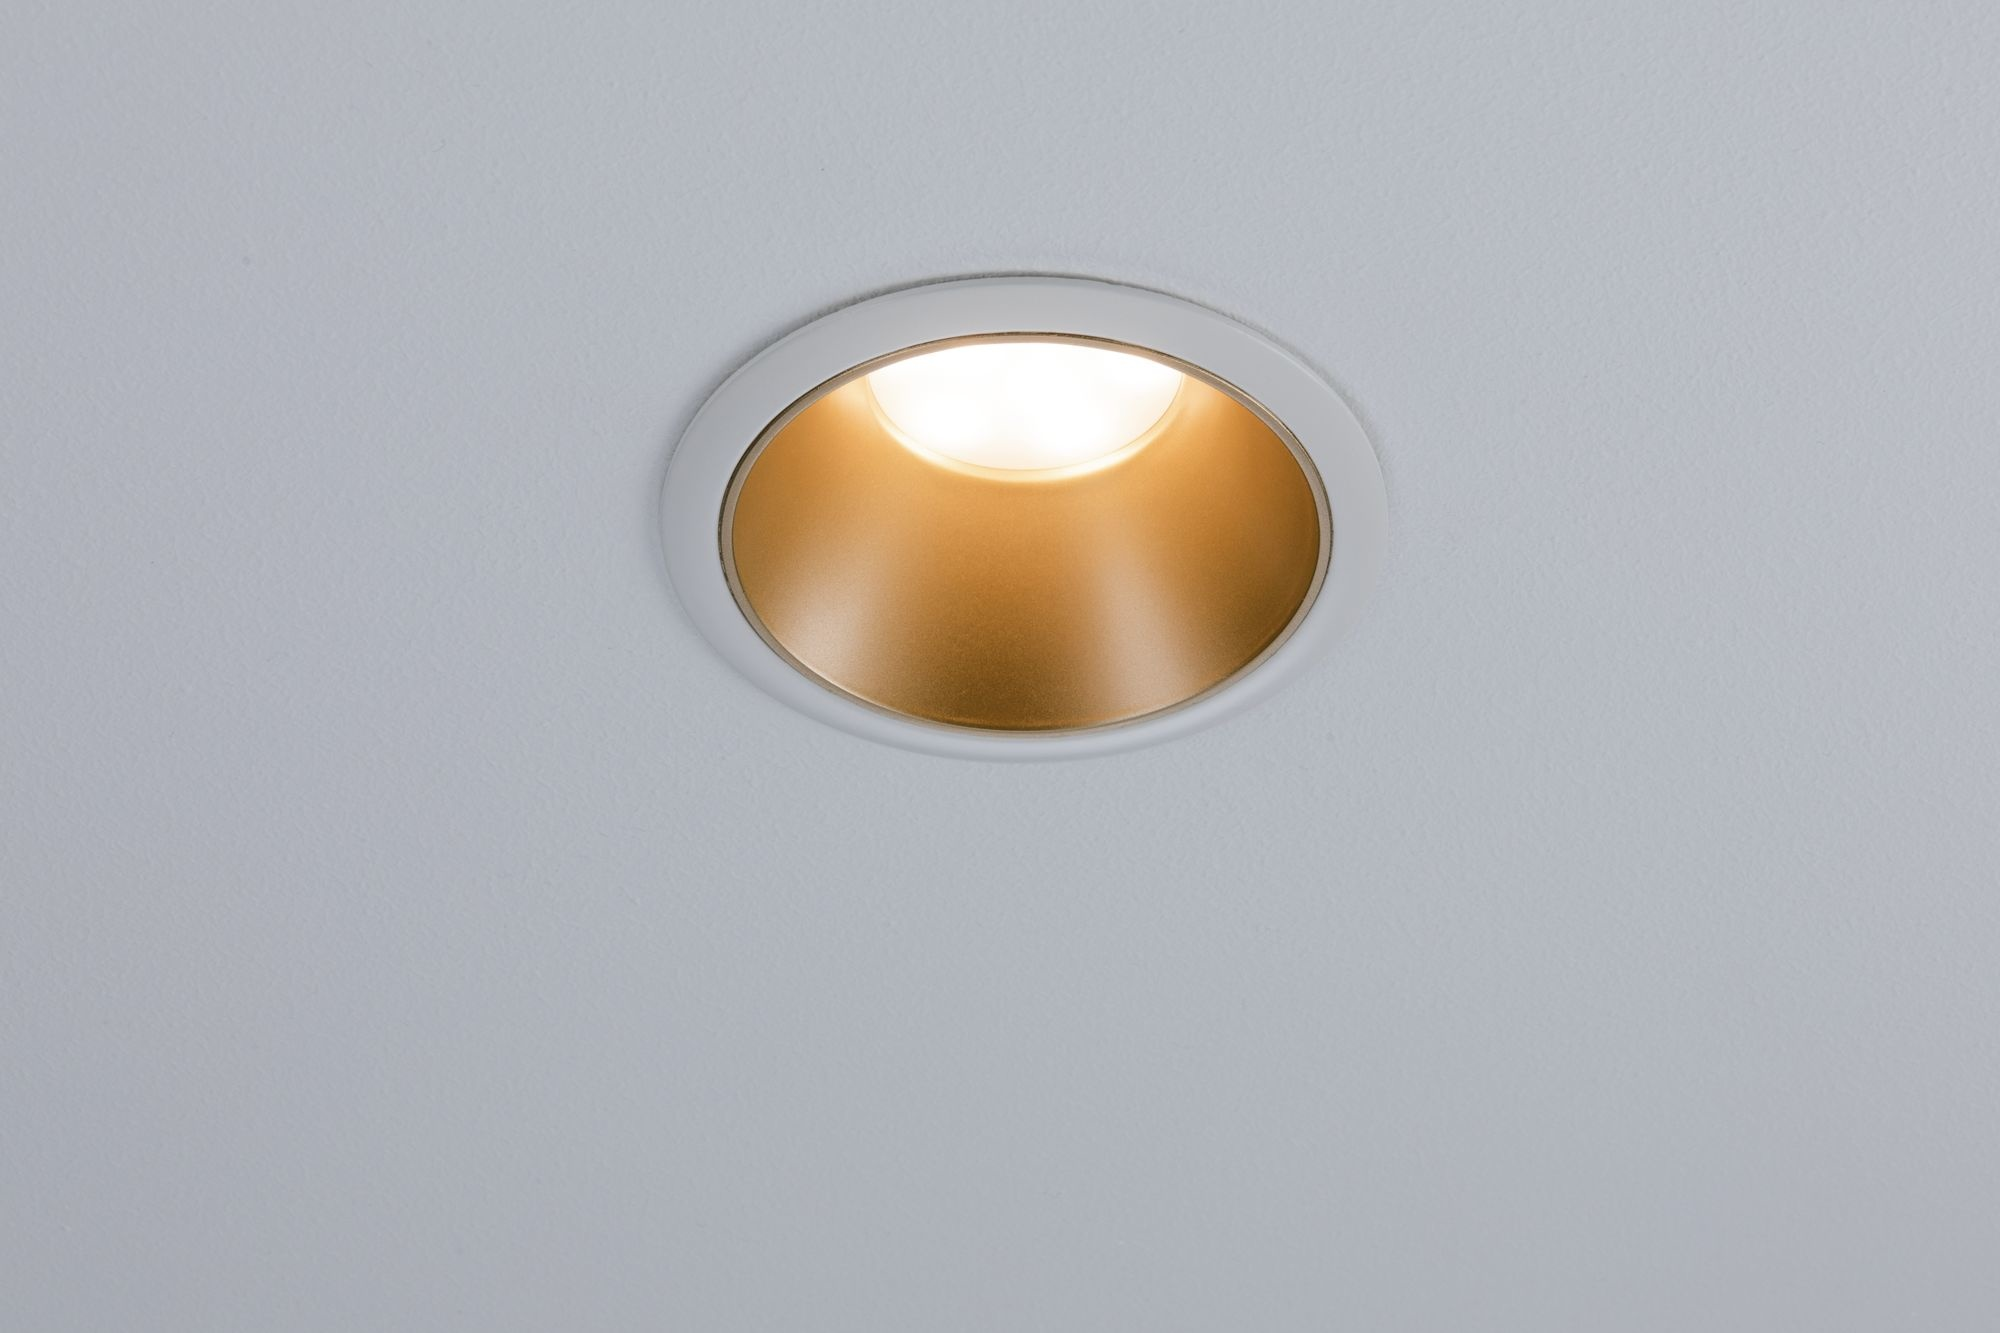 Paulmann EBL Set Cole Coin 3StepDim rd starr LED 1x6,5W 2700K 230V weiß/gold matt/Kst